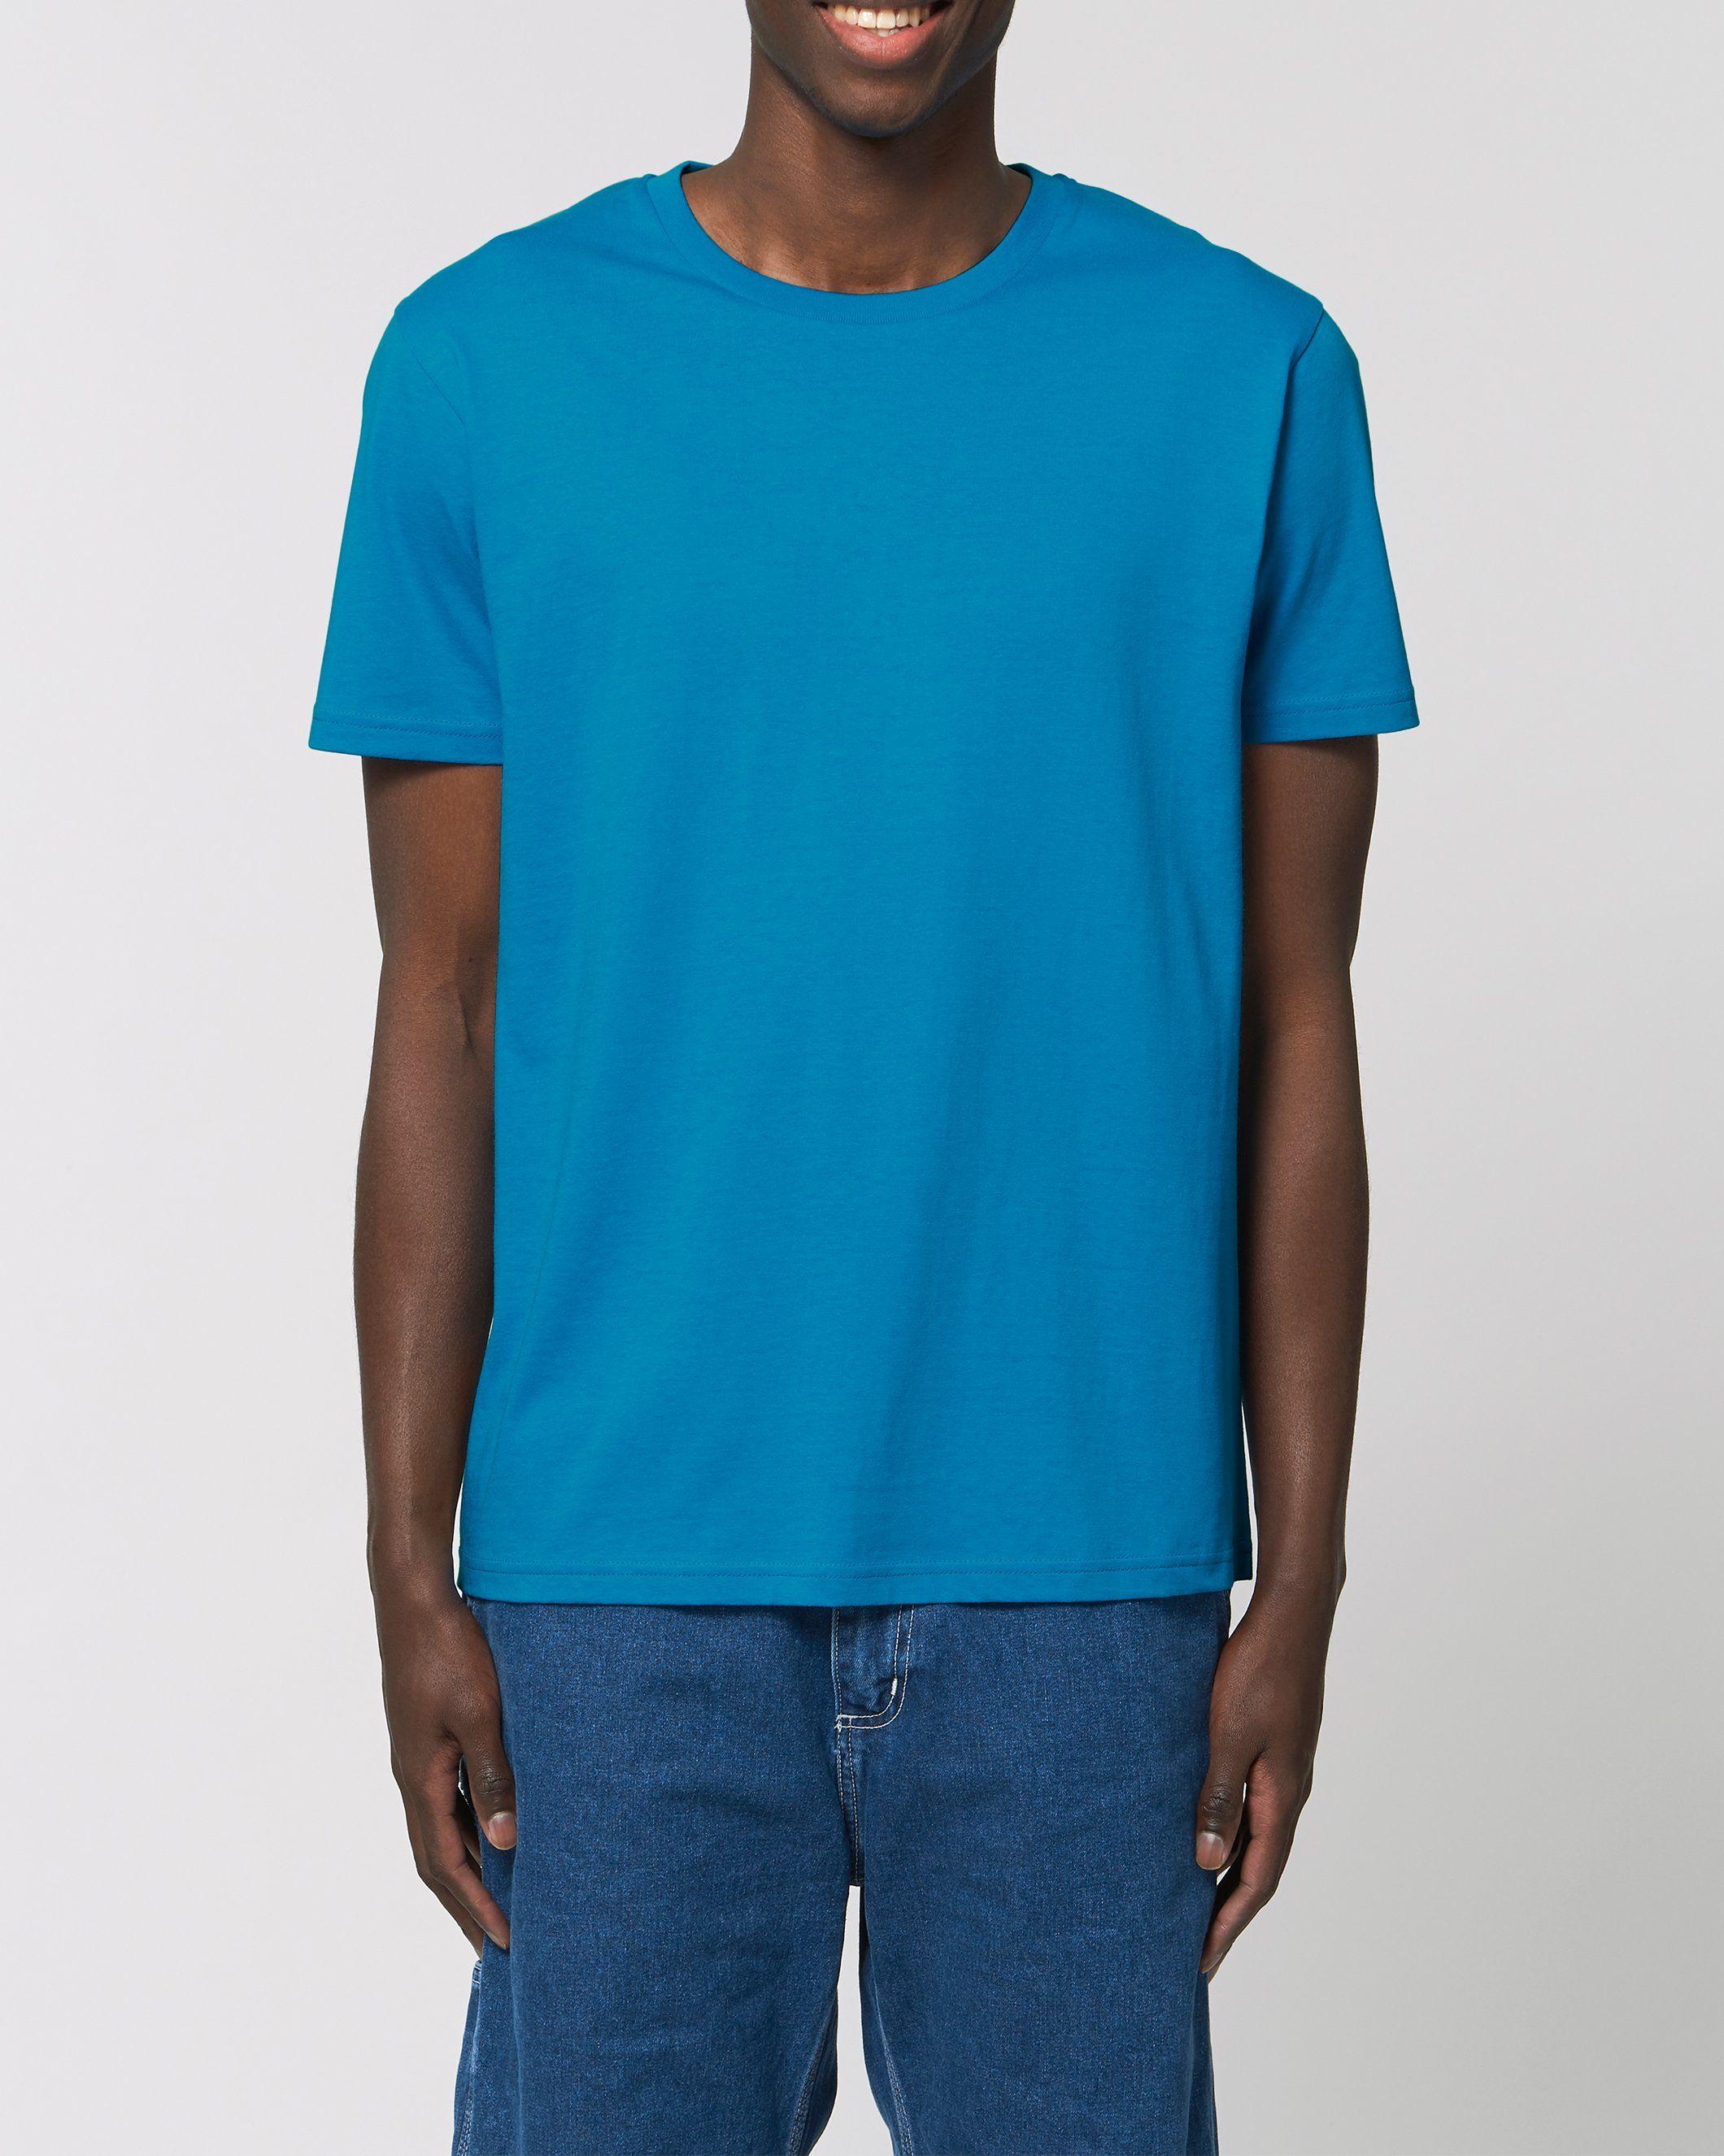 Manas Unisex Regular Fit Tee in Blue